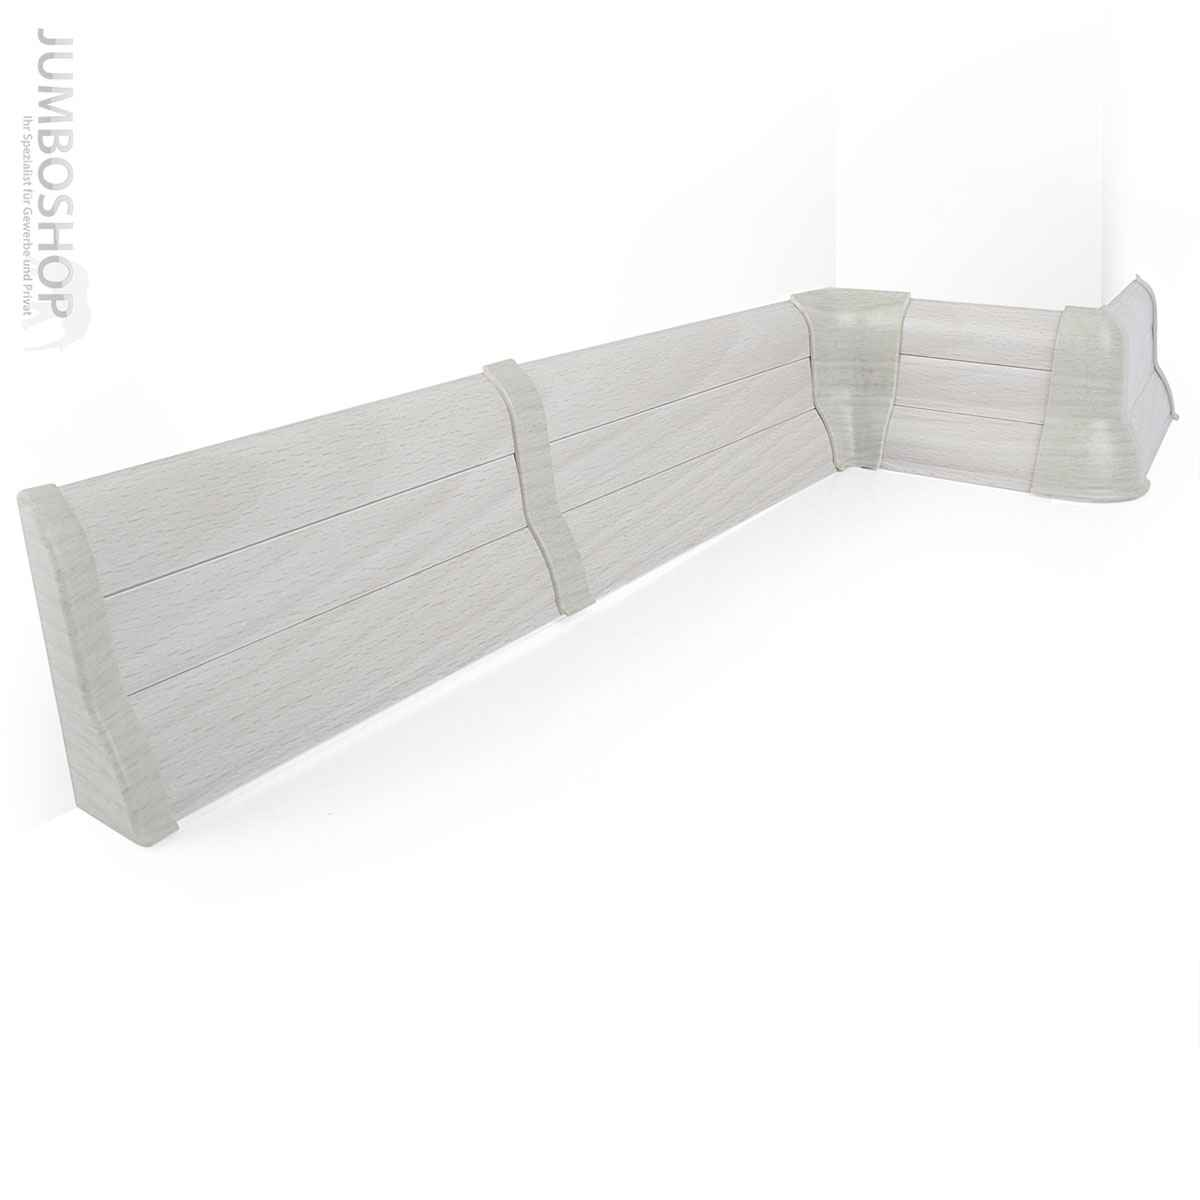 laminat sockelleisten laminat ecken schneiden parador laminat sockelleisten online kaufen im. Black Bedroom Furniture Sets. Home Design Ideas